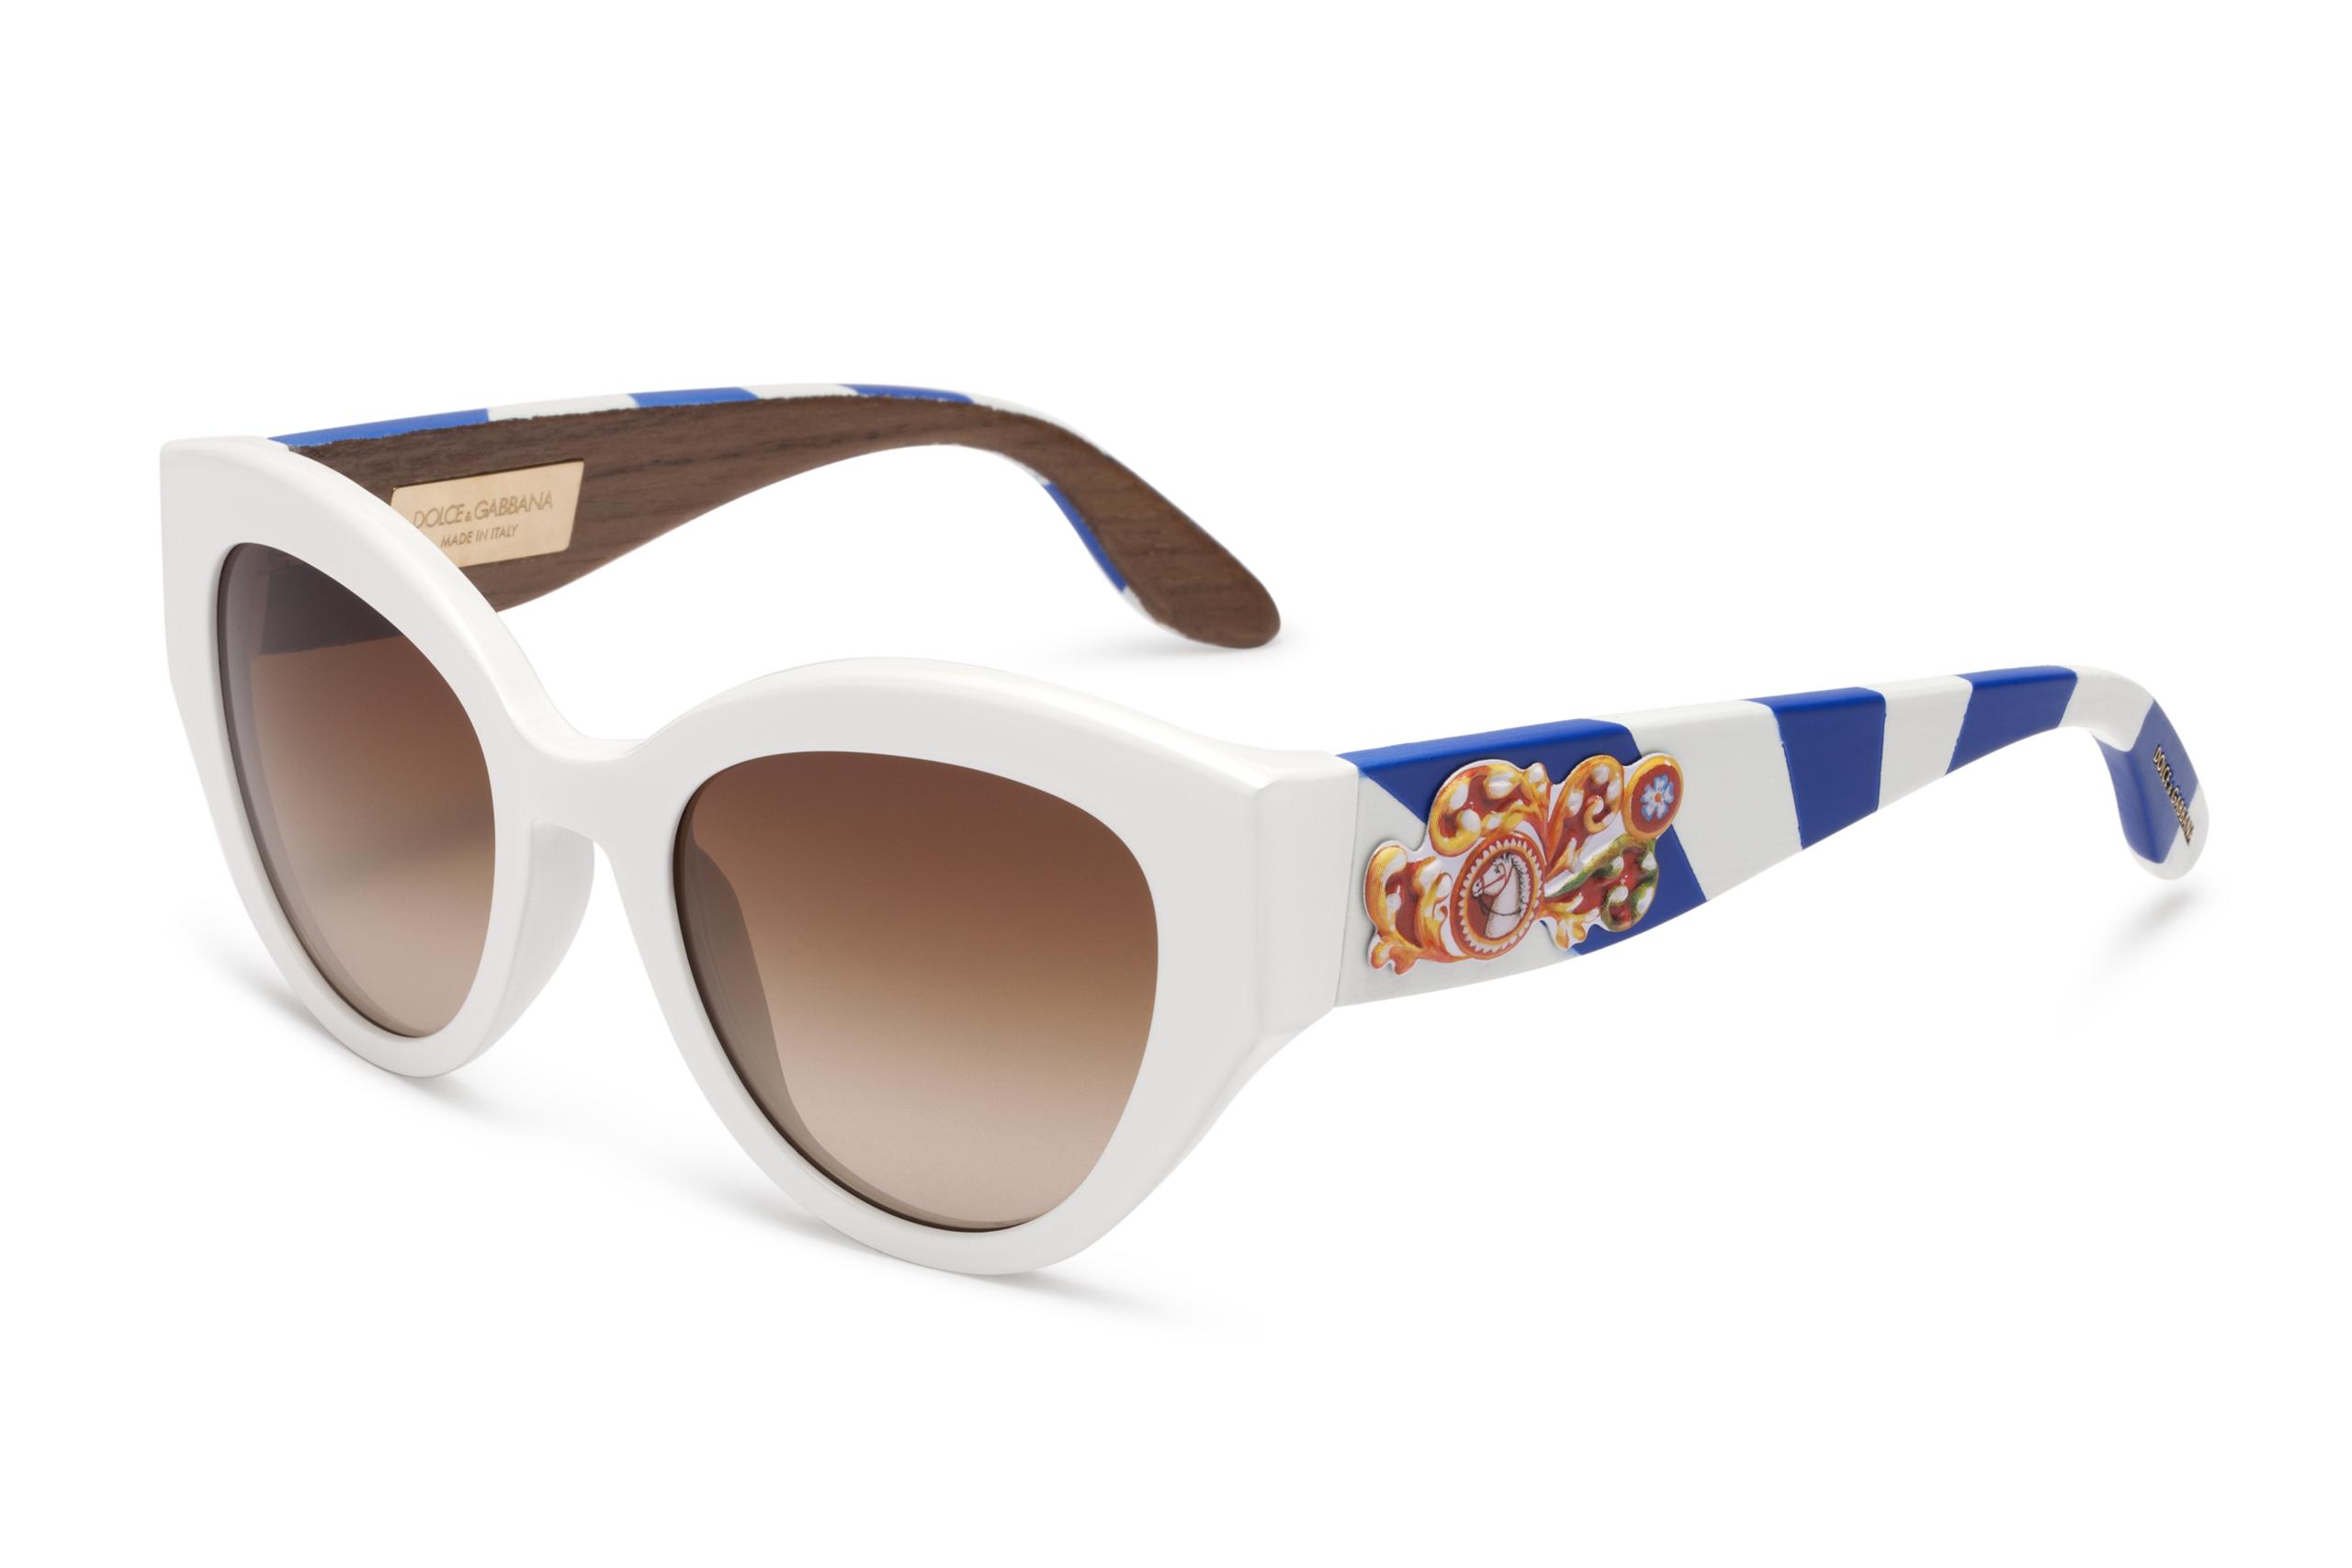 Foto de Gafas de sol Dolce Gabbana Sicilian Carretto (7/12)